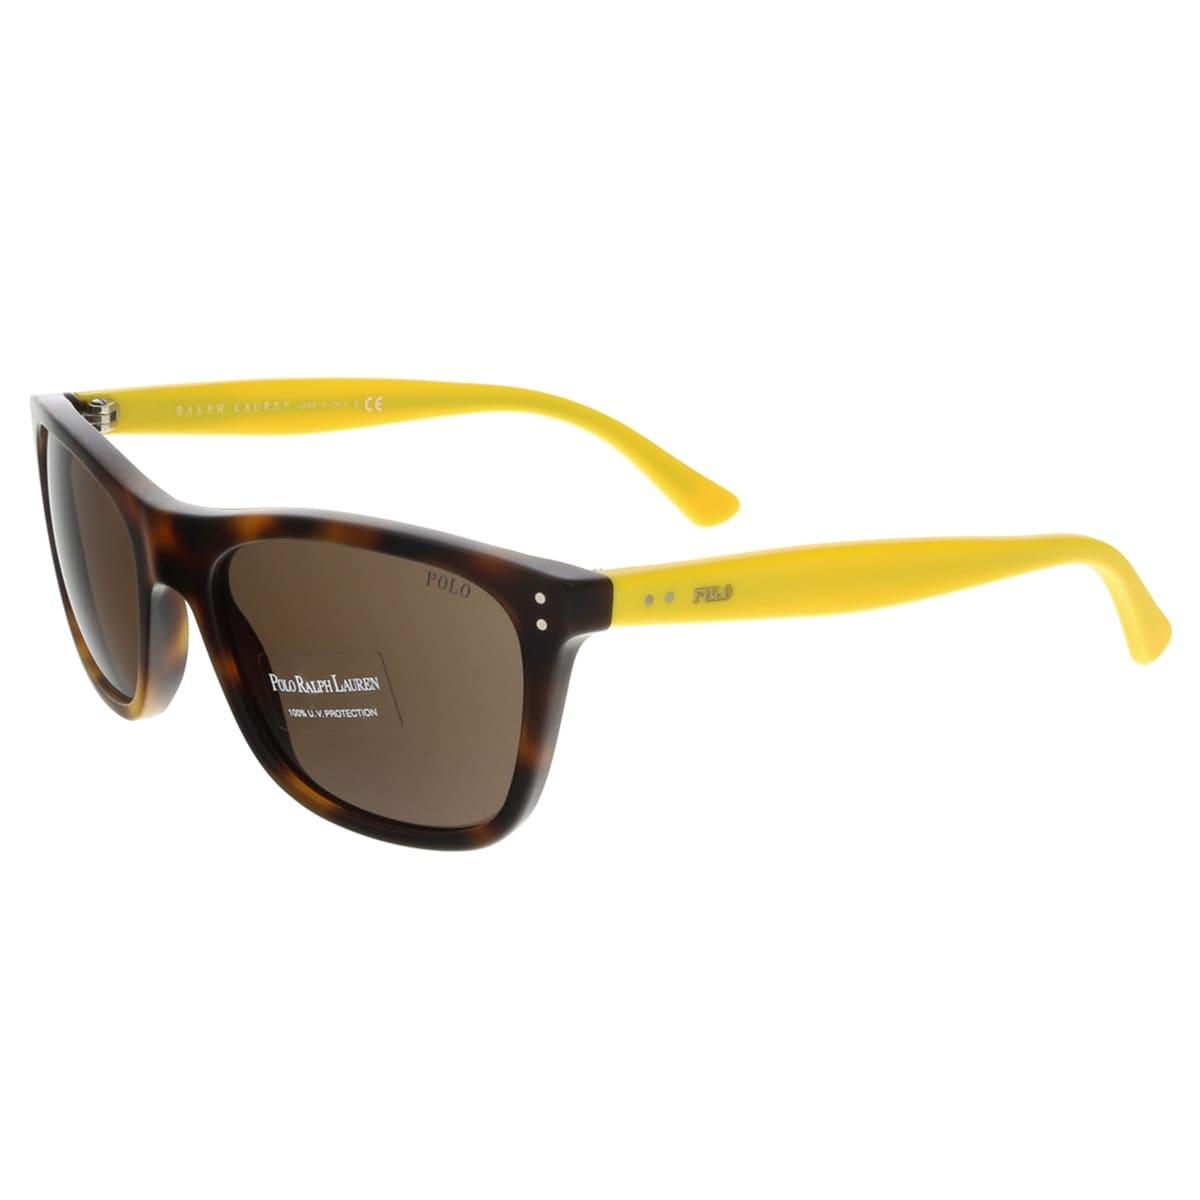 0548bdf8f0 Ralph Lauren Sunglasses